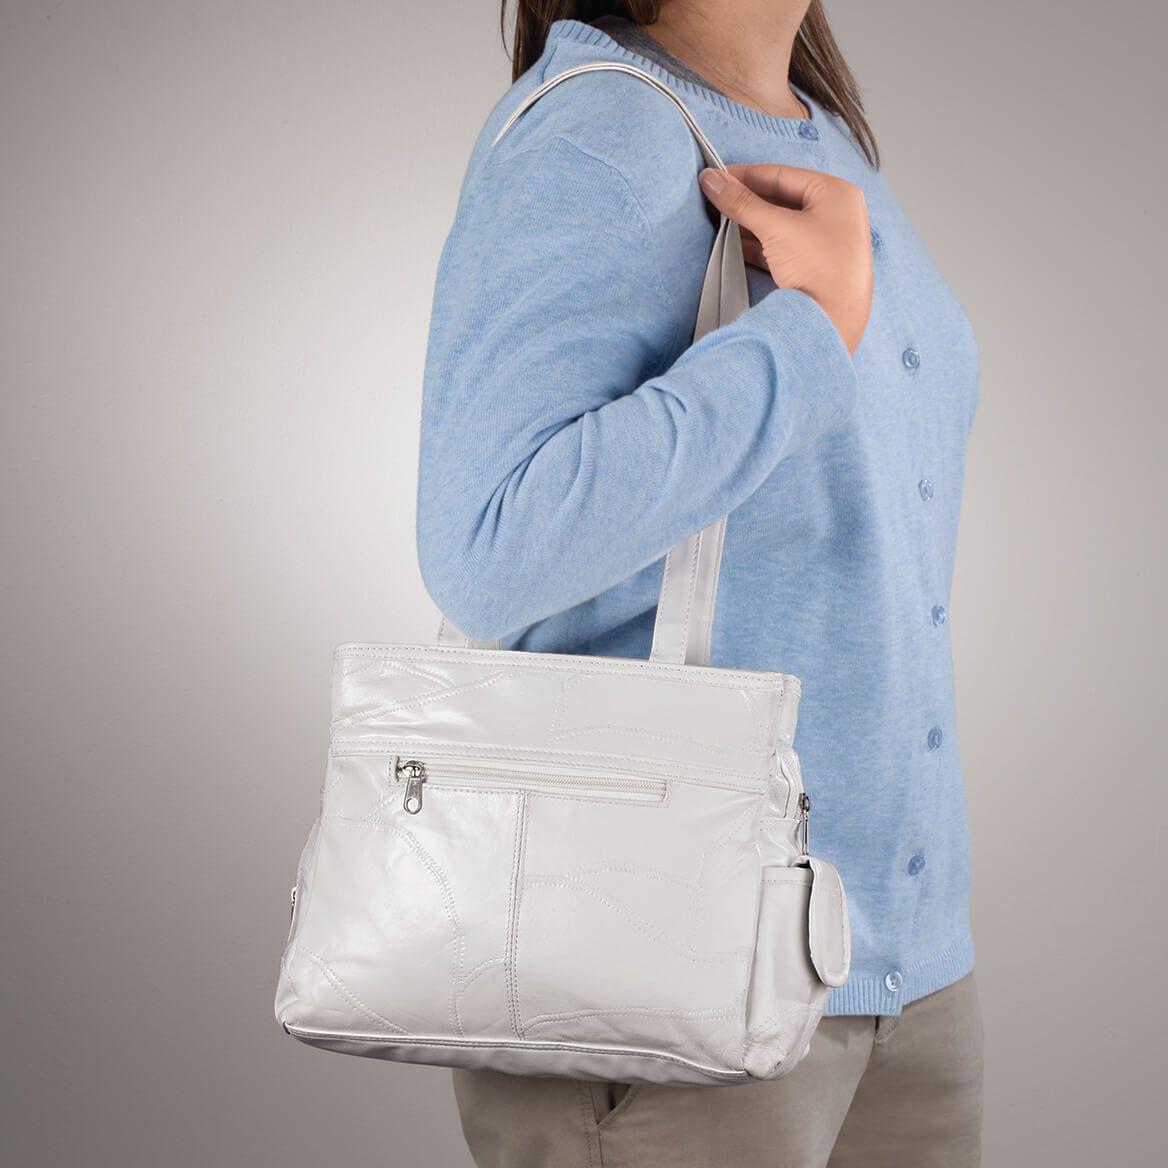 White Leather Handbag-344917